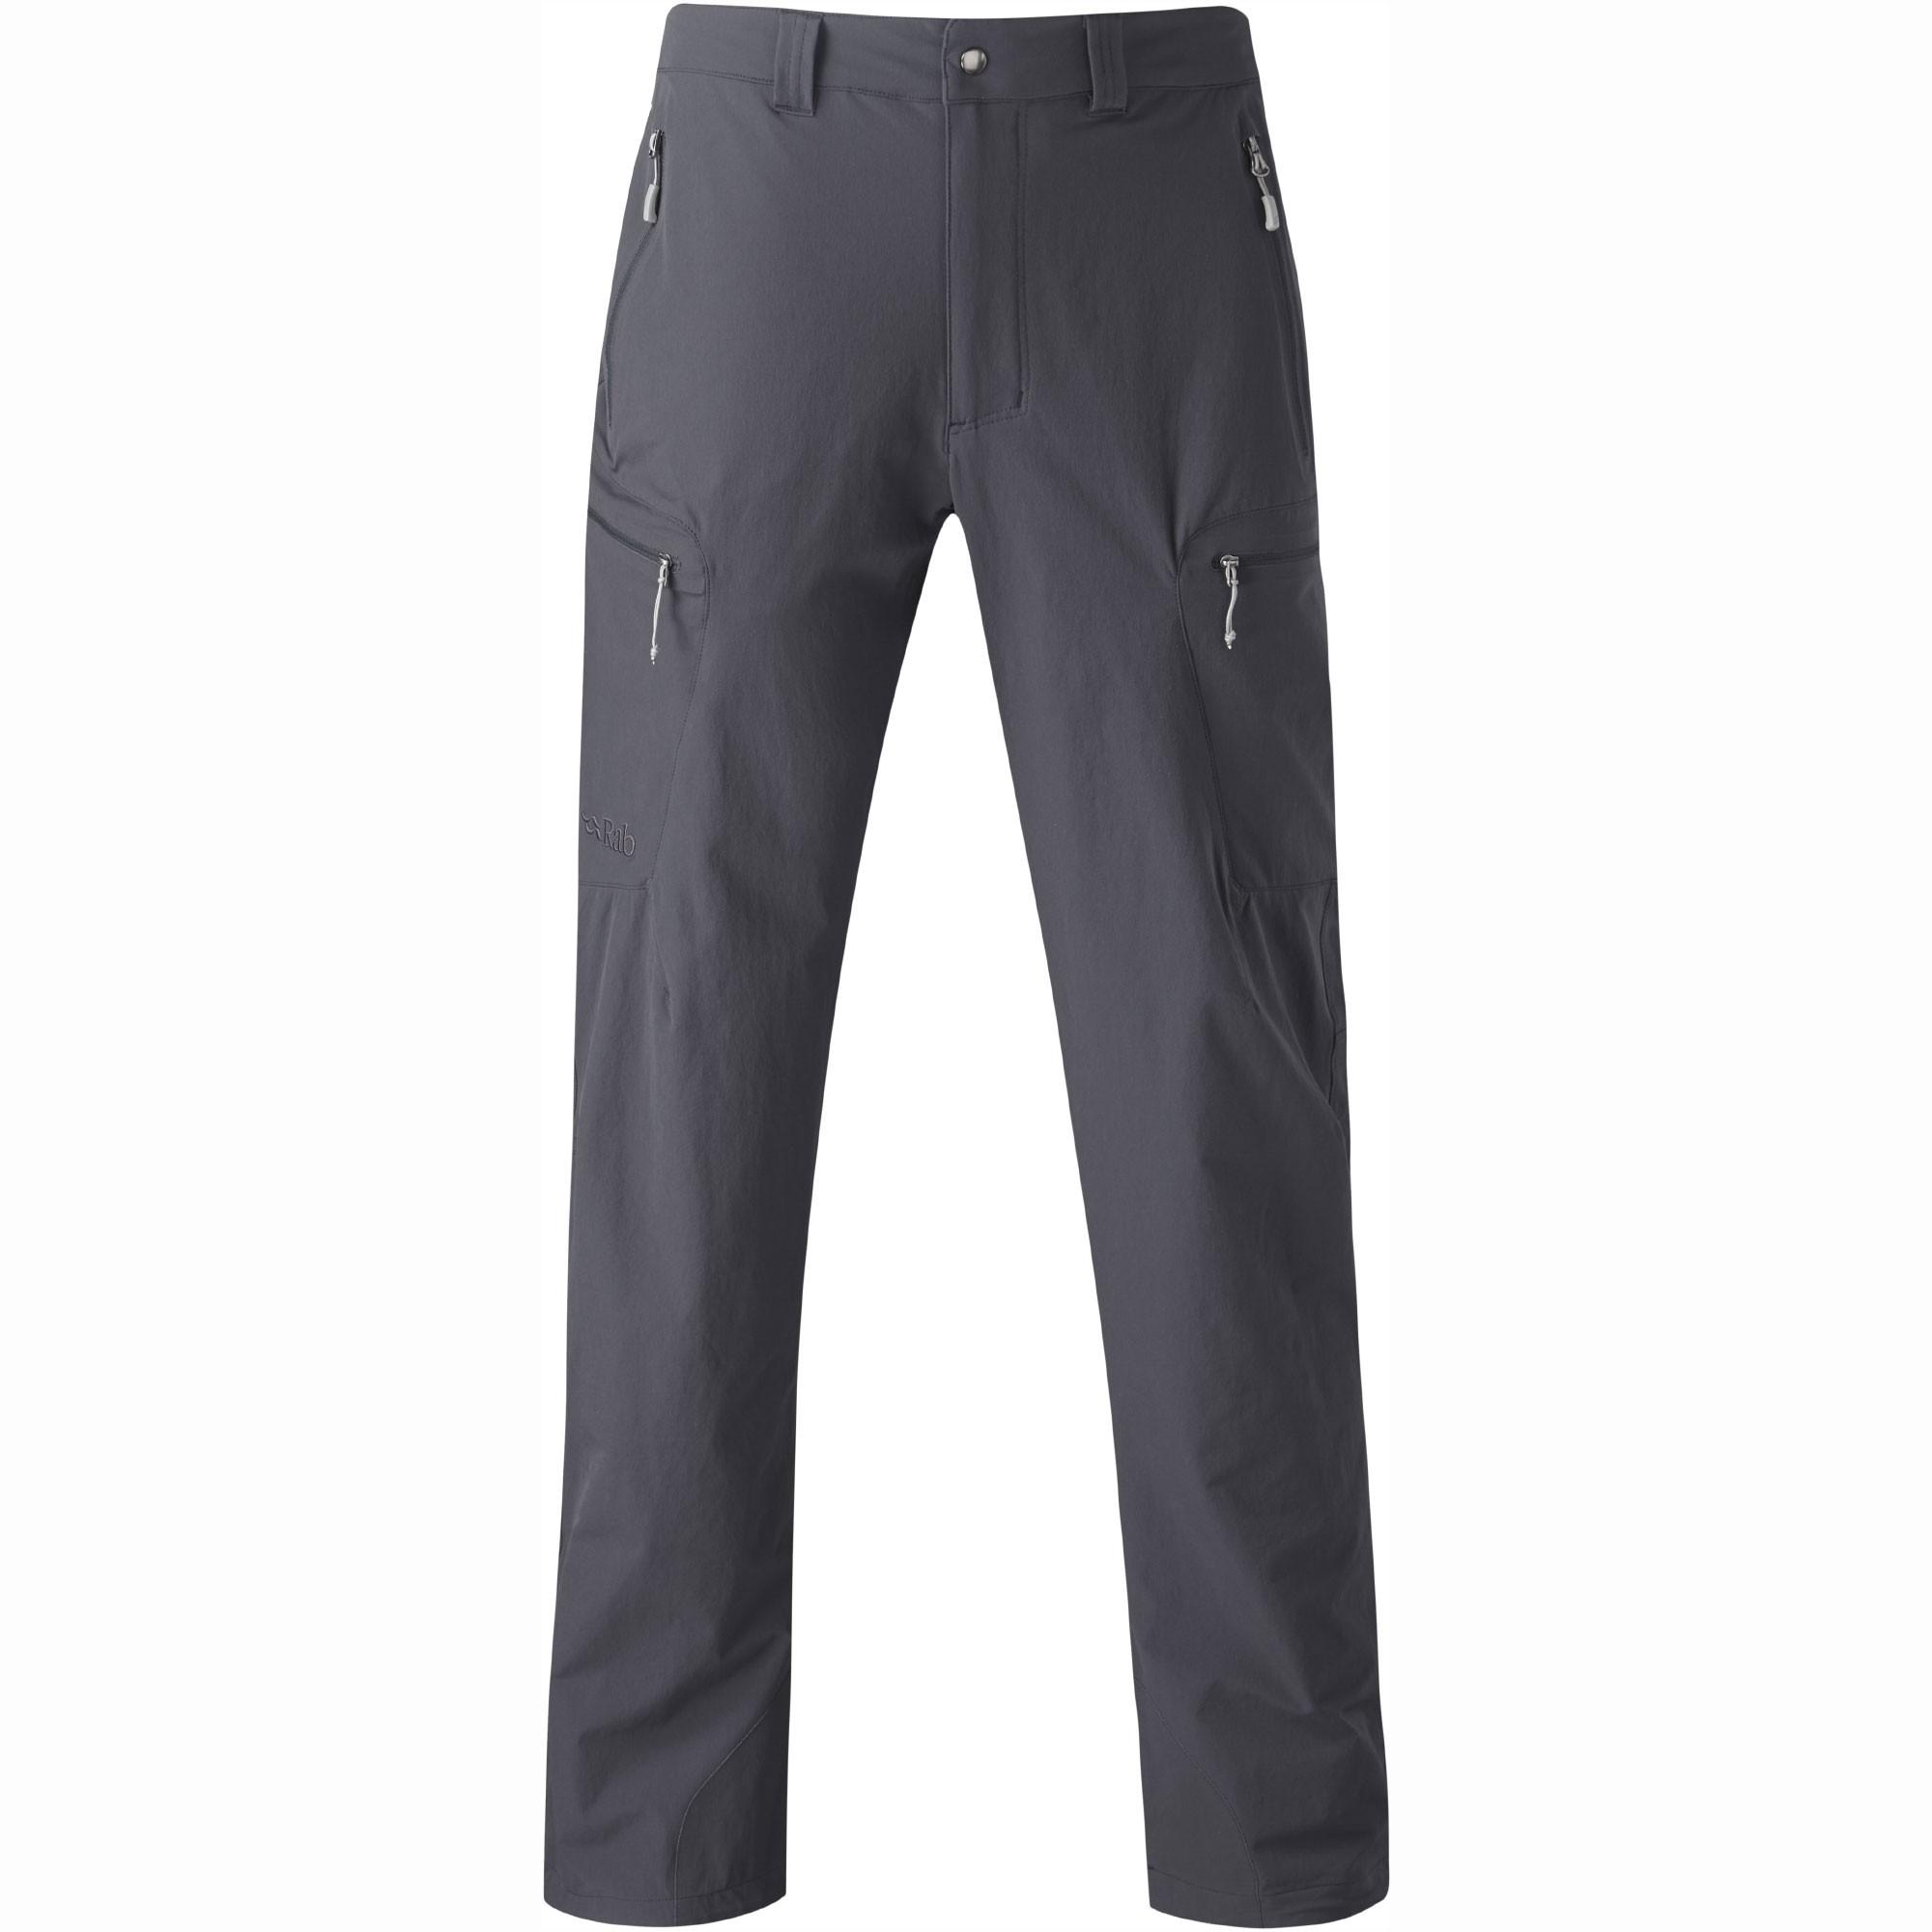 Rab Sawtooth Men's Softshell Pants - Beluga